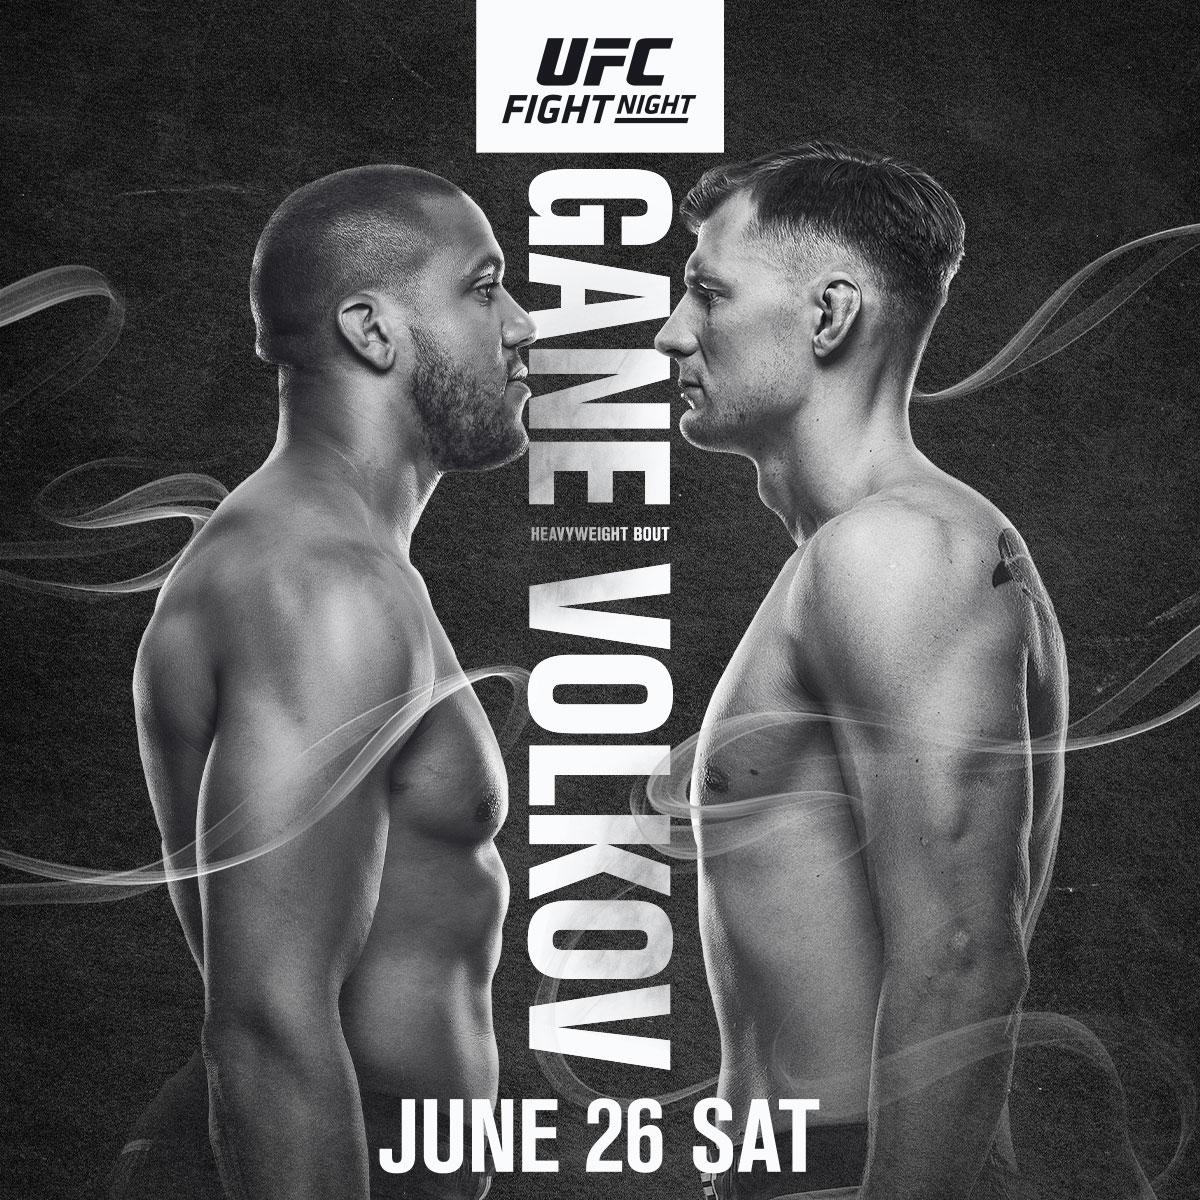 We've got heavyweights in 𝗽𝗿𝗶𝗺𝗲𝘁𝗶𝗺𝗲 this Saturday at #UFCVegas30  🇫🇷 @Ciryl_Gane vs @AlexDragoVolkov 🇷🇺 https://t.co/dMnEHcEM4E